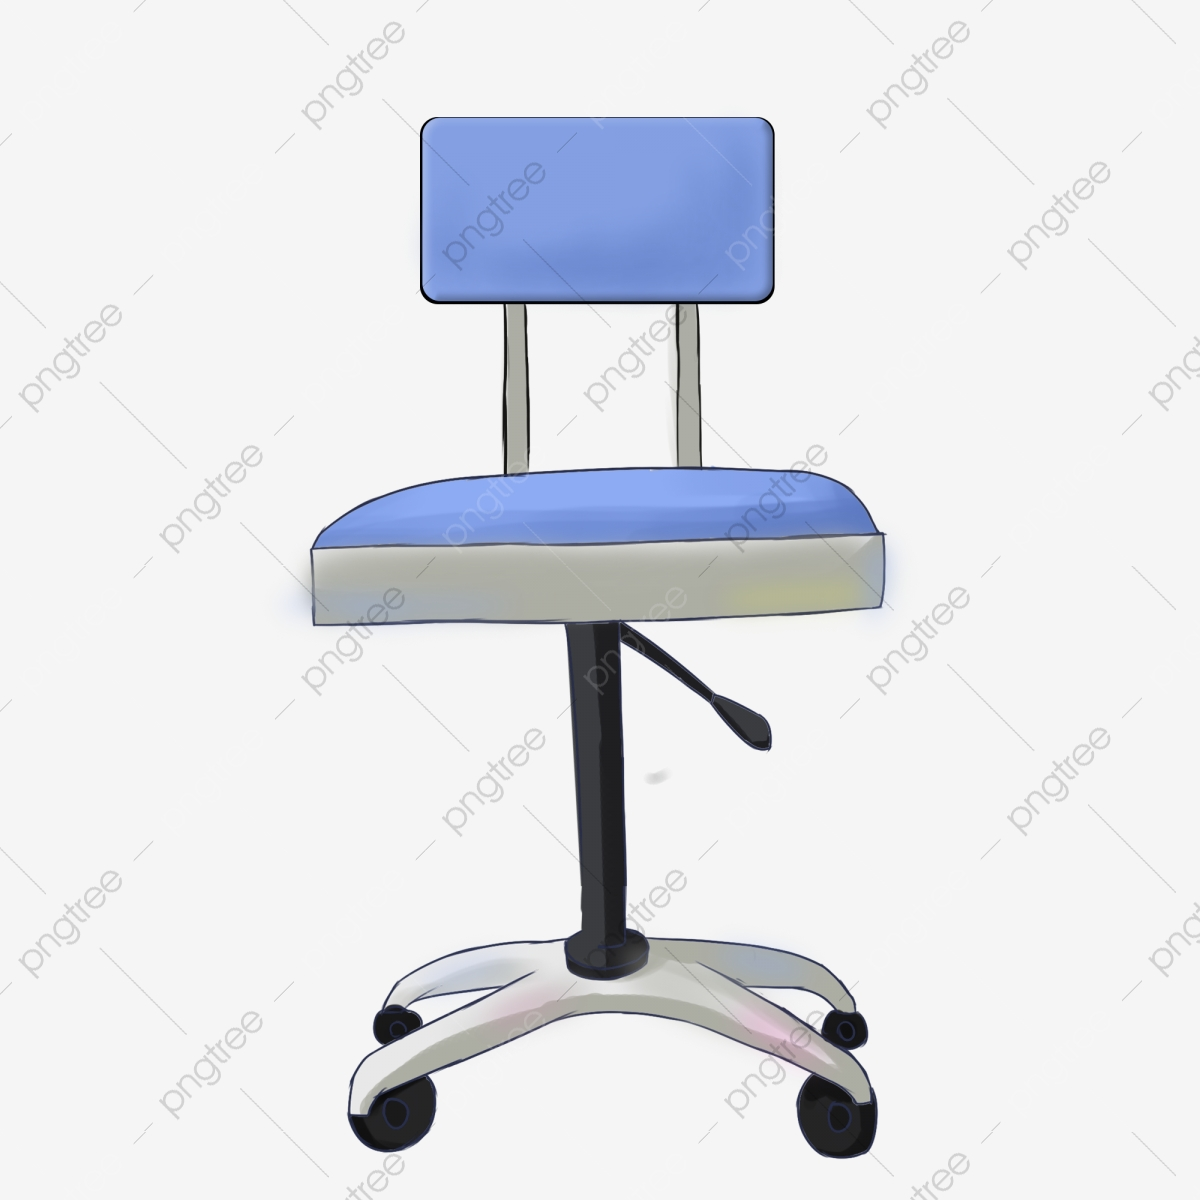 Office Supplies Blue Chair Office Supplies Blue Chairs